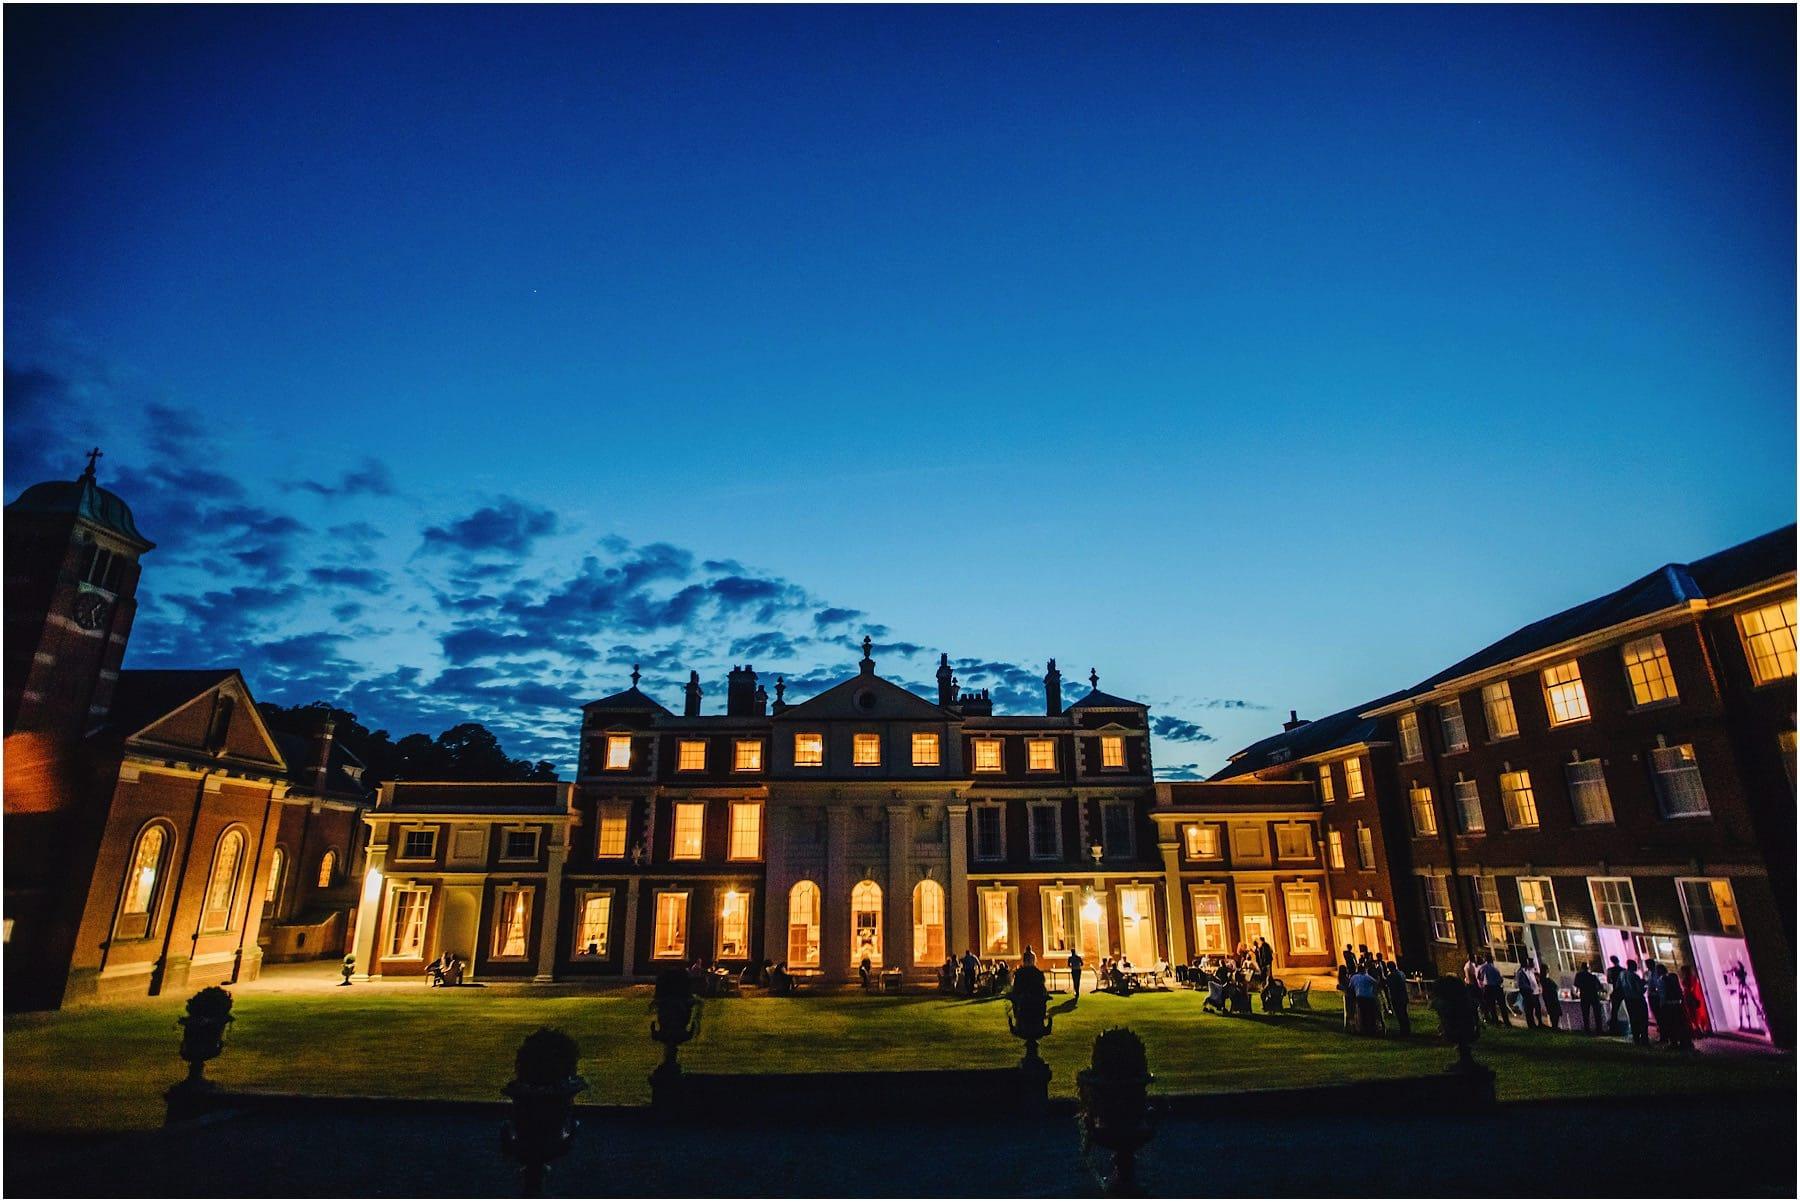 Hawkstone Hall by Night